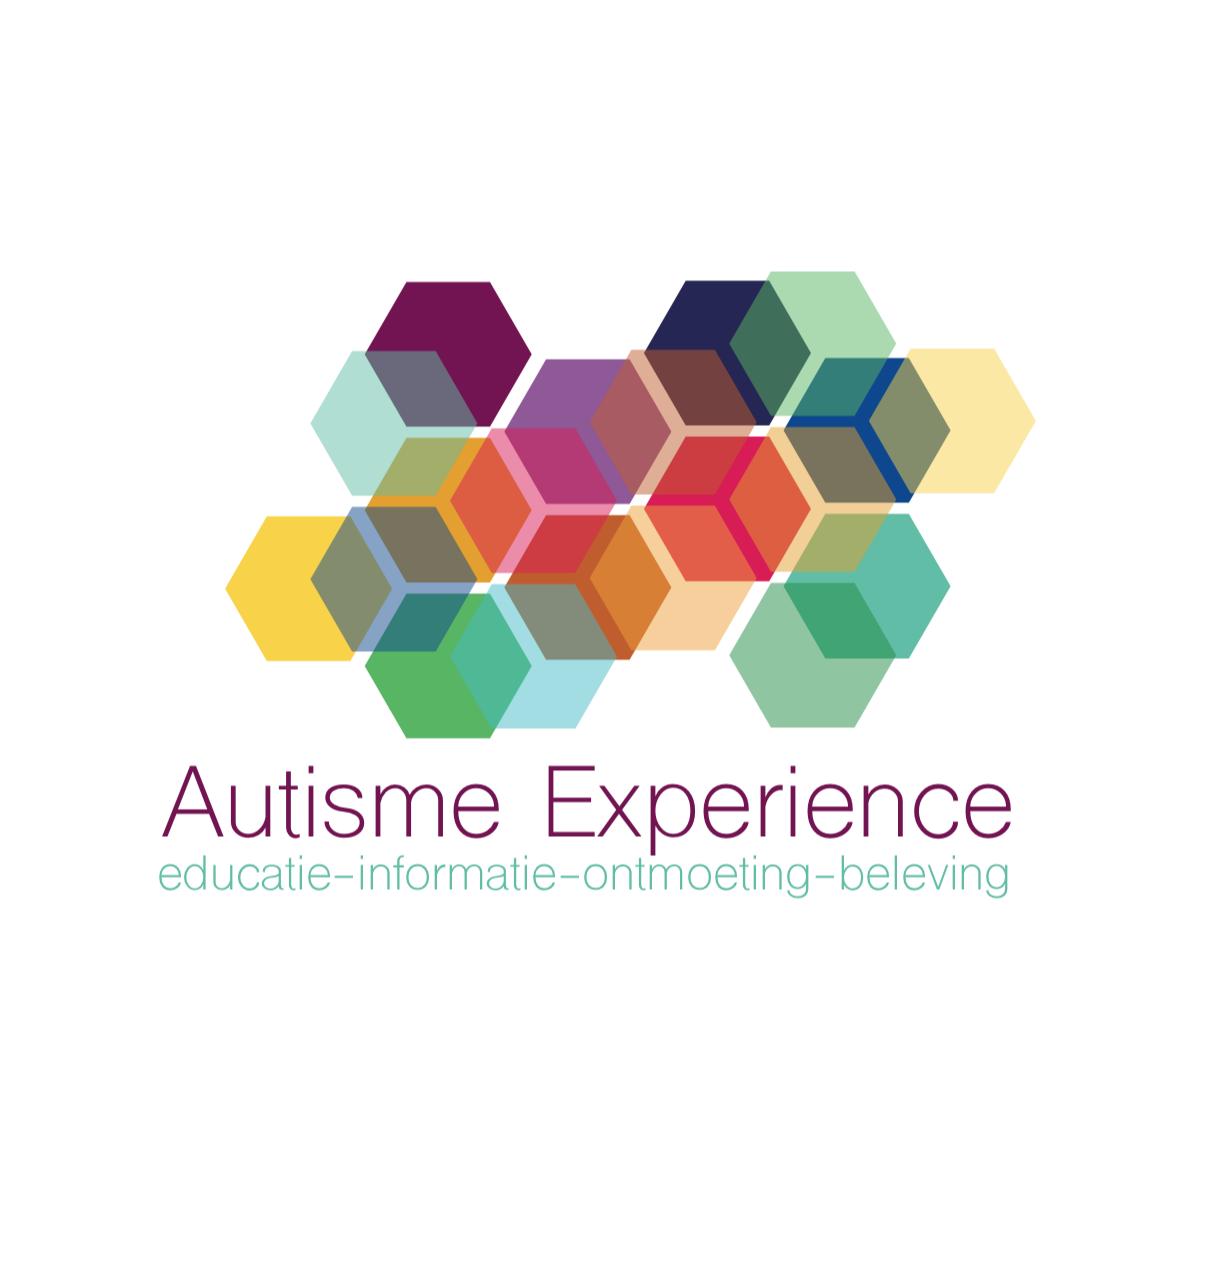 Autisme Experience